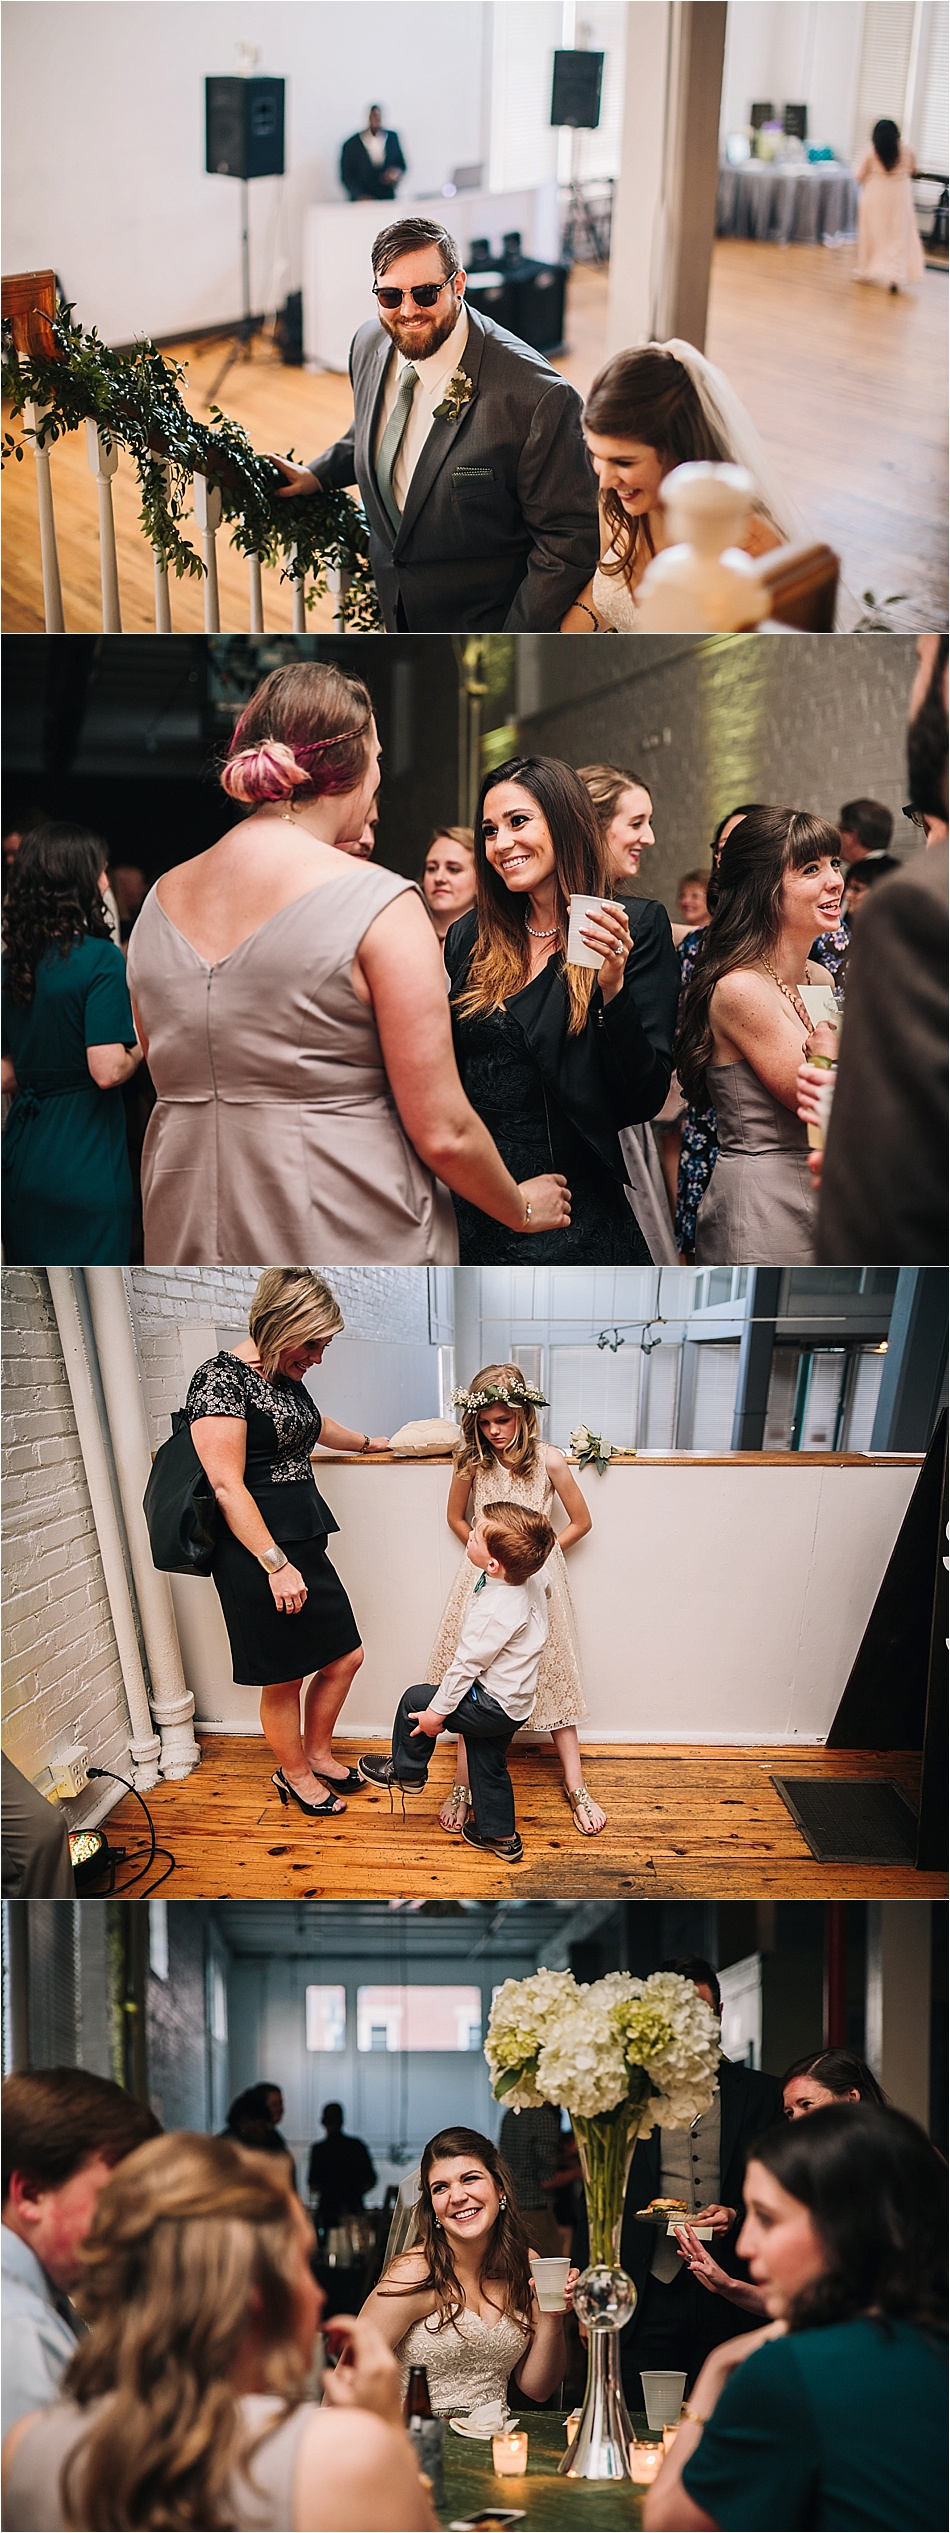 CK-Photo-Nashville-Wedding-Photographer-_0030.jpg